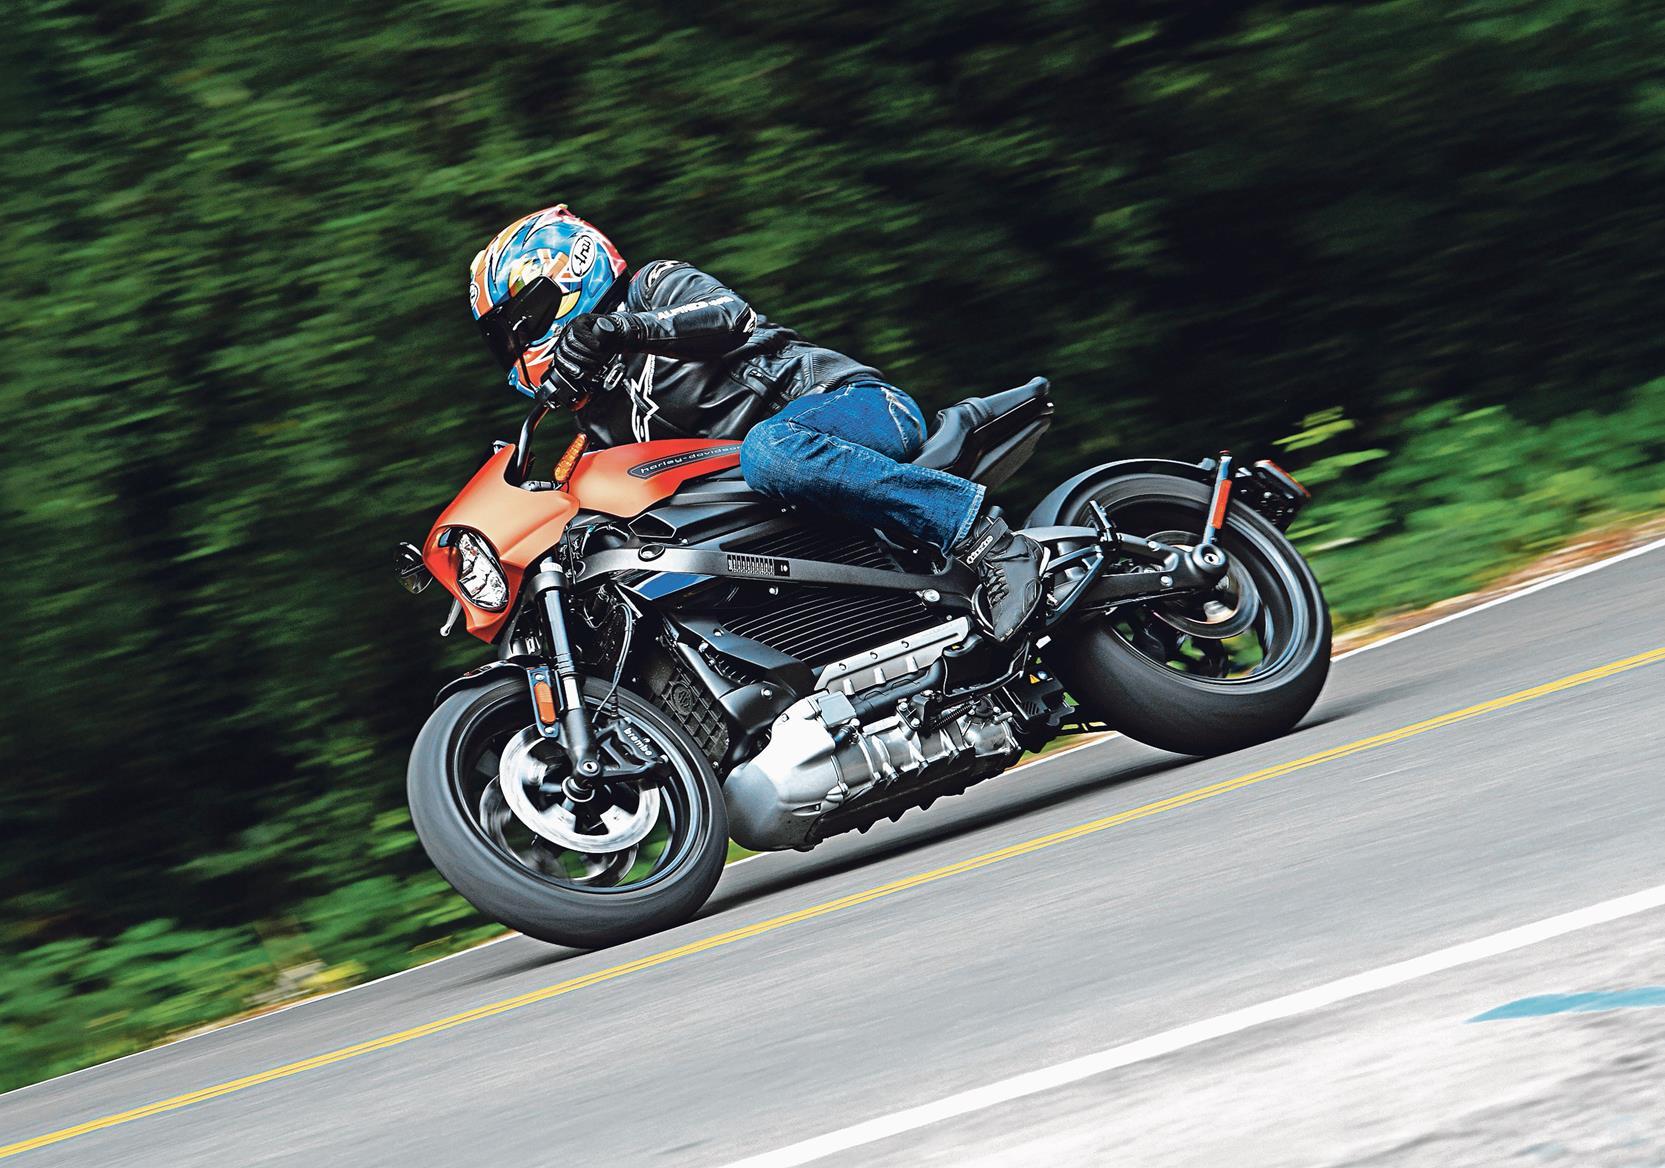 Harley-Davidson release the LiveWire